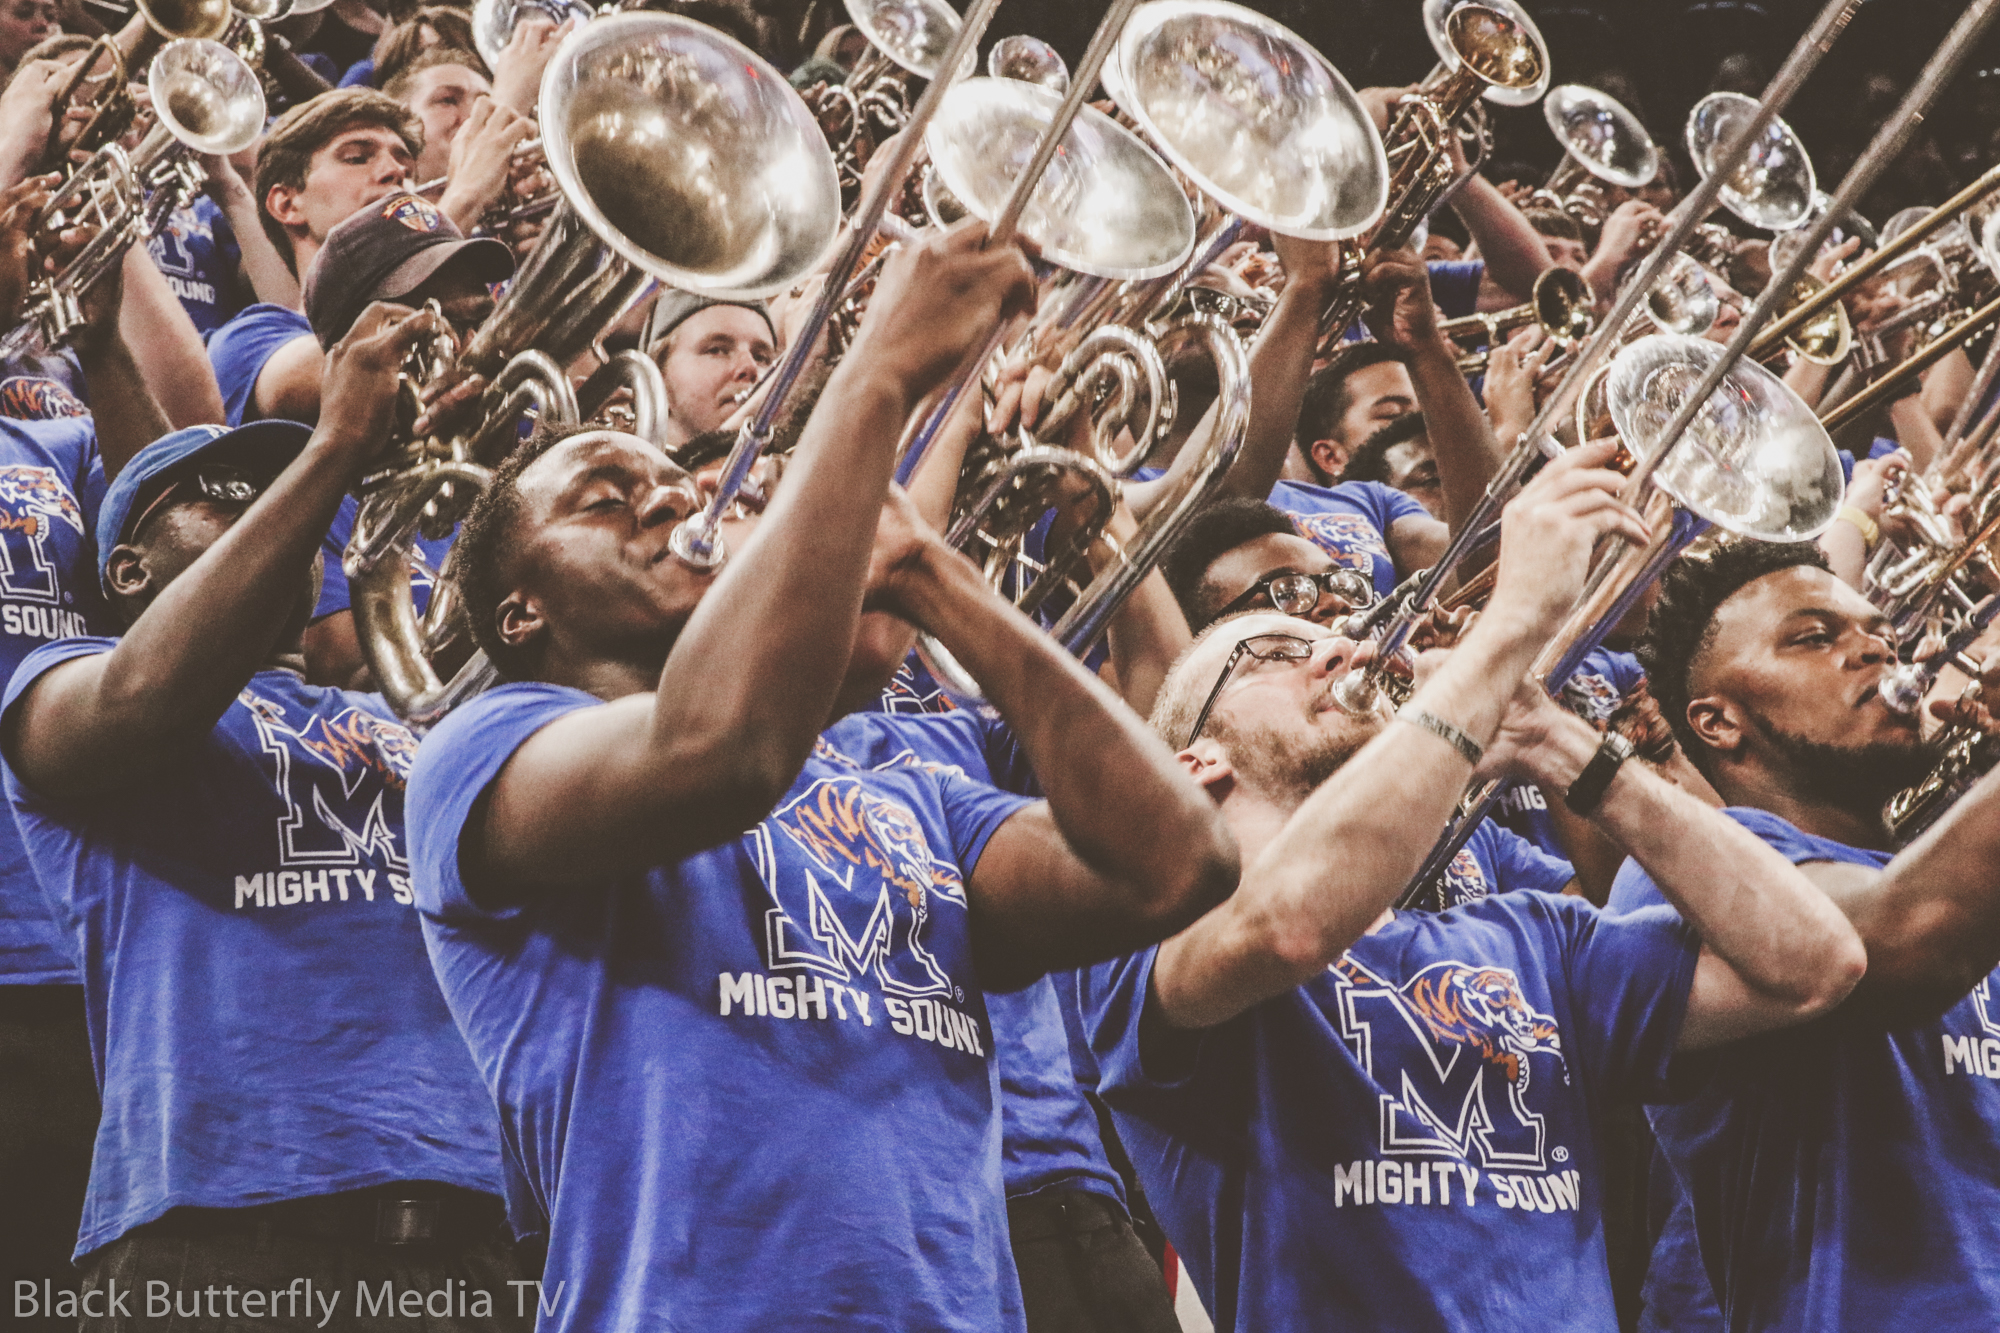 University of Memphis Mighty Sound